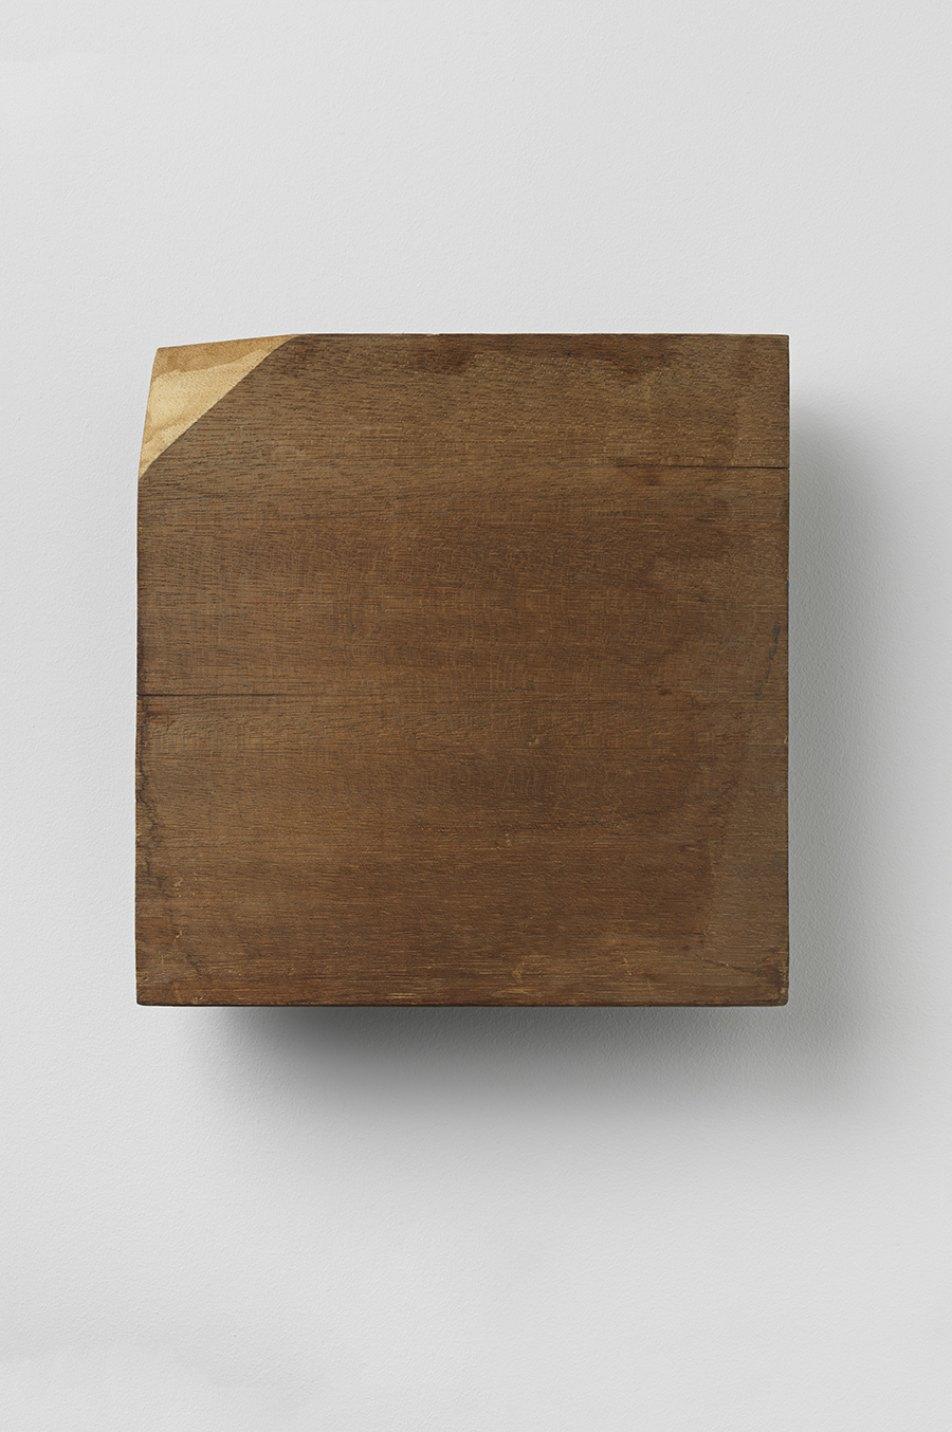 Kishio Suga,<em>&nbsp;Spatial Extremity,</em> 1981, wood, 25,5 × 25 × 6,6 cm - Mendes Wood DM